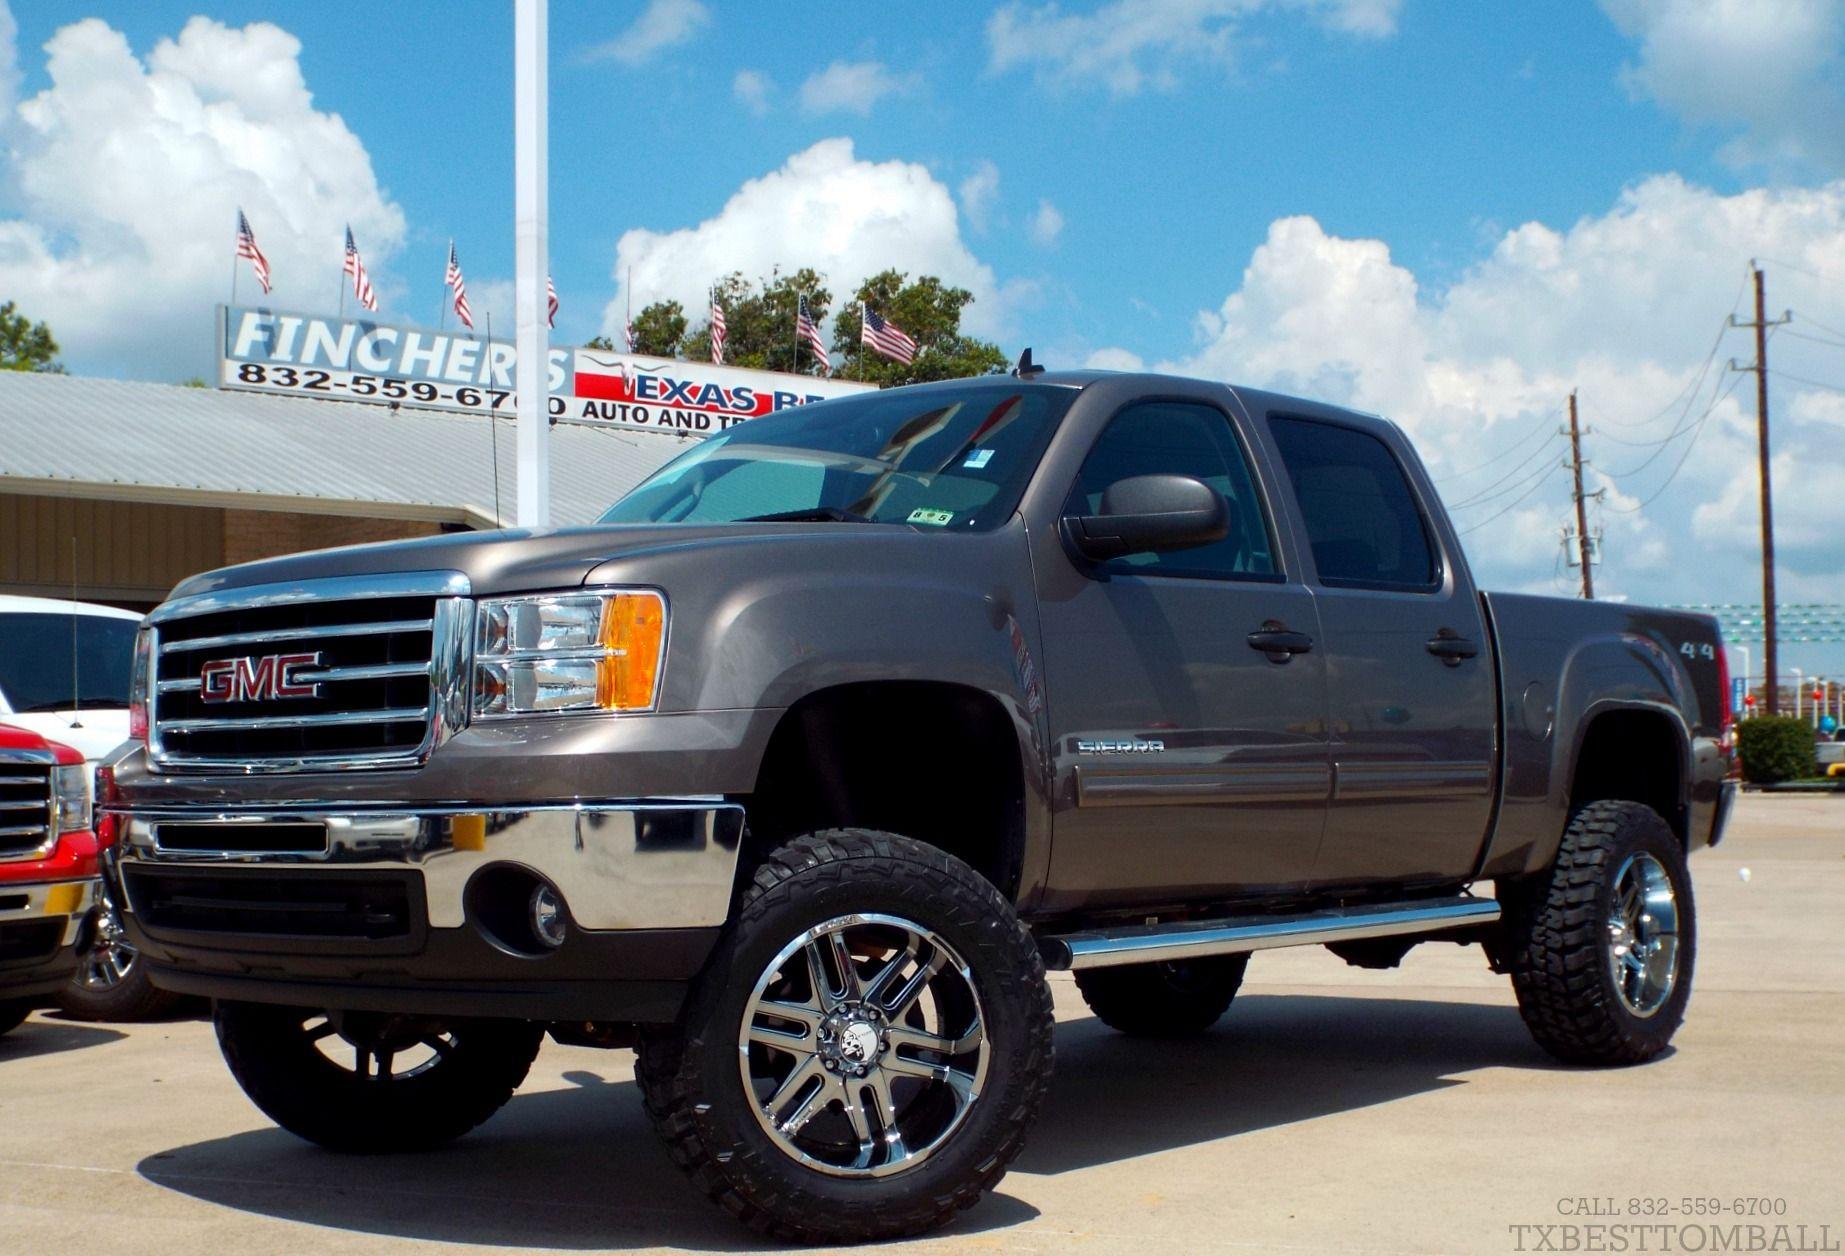 4x4 trucks for sale sierra 1500 texas cars